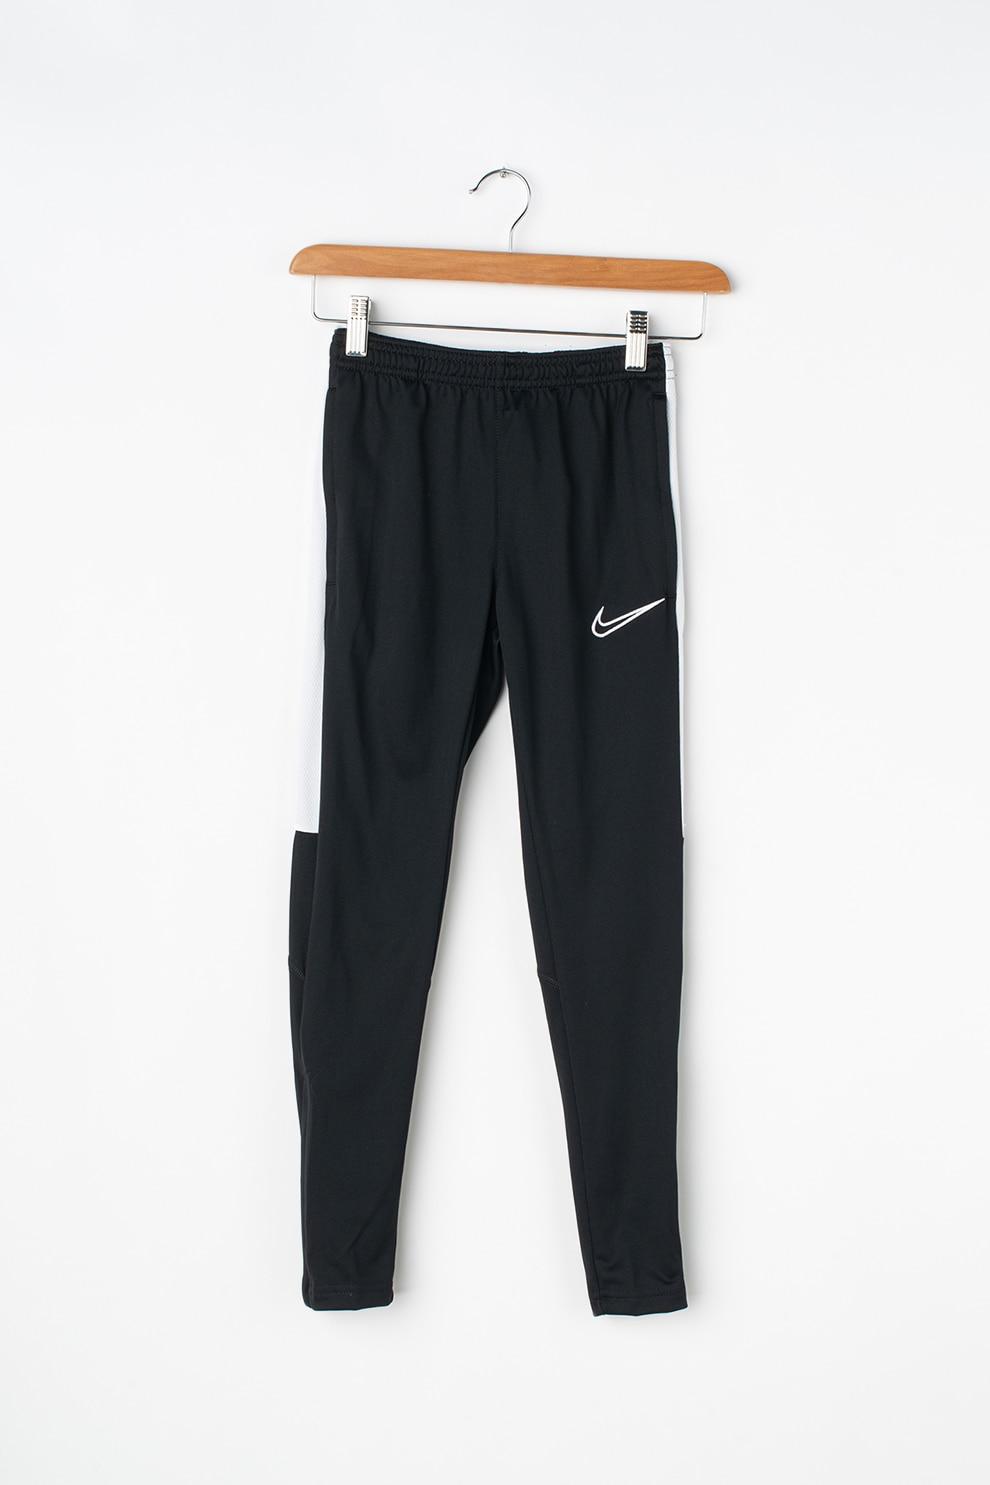 Intestinos Espacioso soltar  Nike, Pantaloni pentru fitness, realizati cu Dri-Fit, Negru/Alb, XS -  eMAG.ro